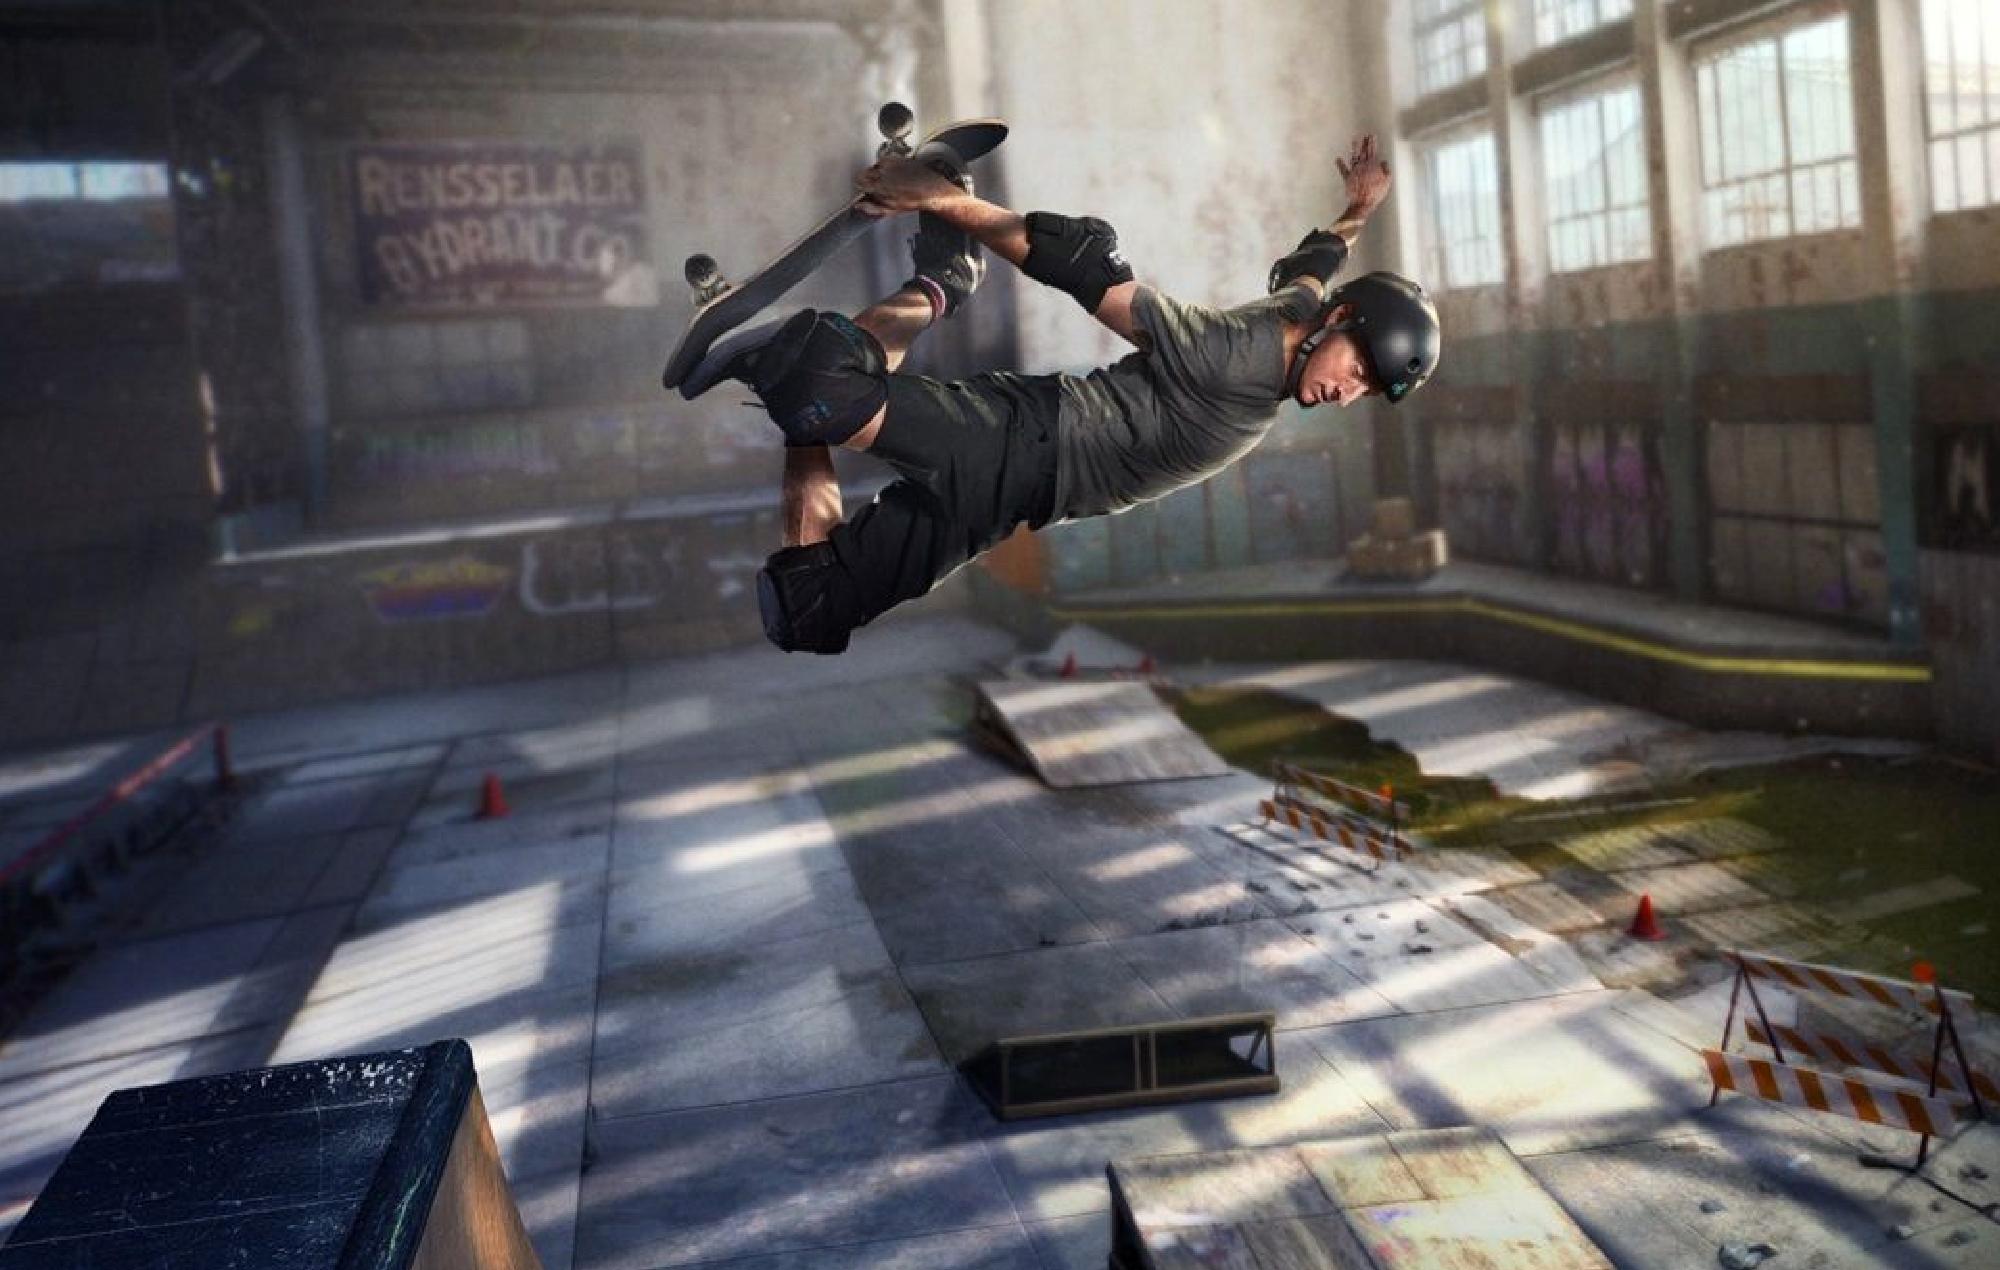 The Best Tricks in Tony Hawk Video Games